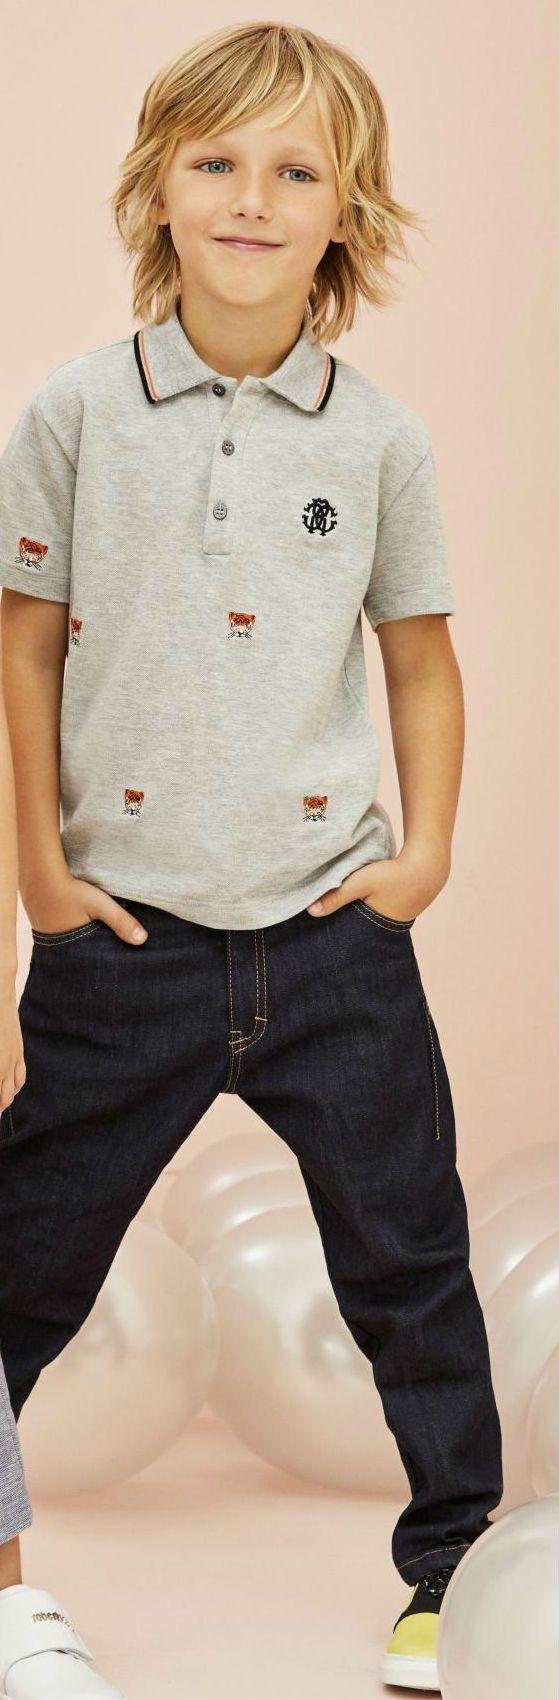 Cool! Roberto Cavalli Junior Boys Embellished Grey Tiger Polo Shirt Black Pants Spring Summer 2018. #robertocavalli #kidsfashion #boy #kids #cool #summer #style #fashion